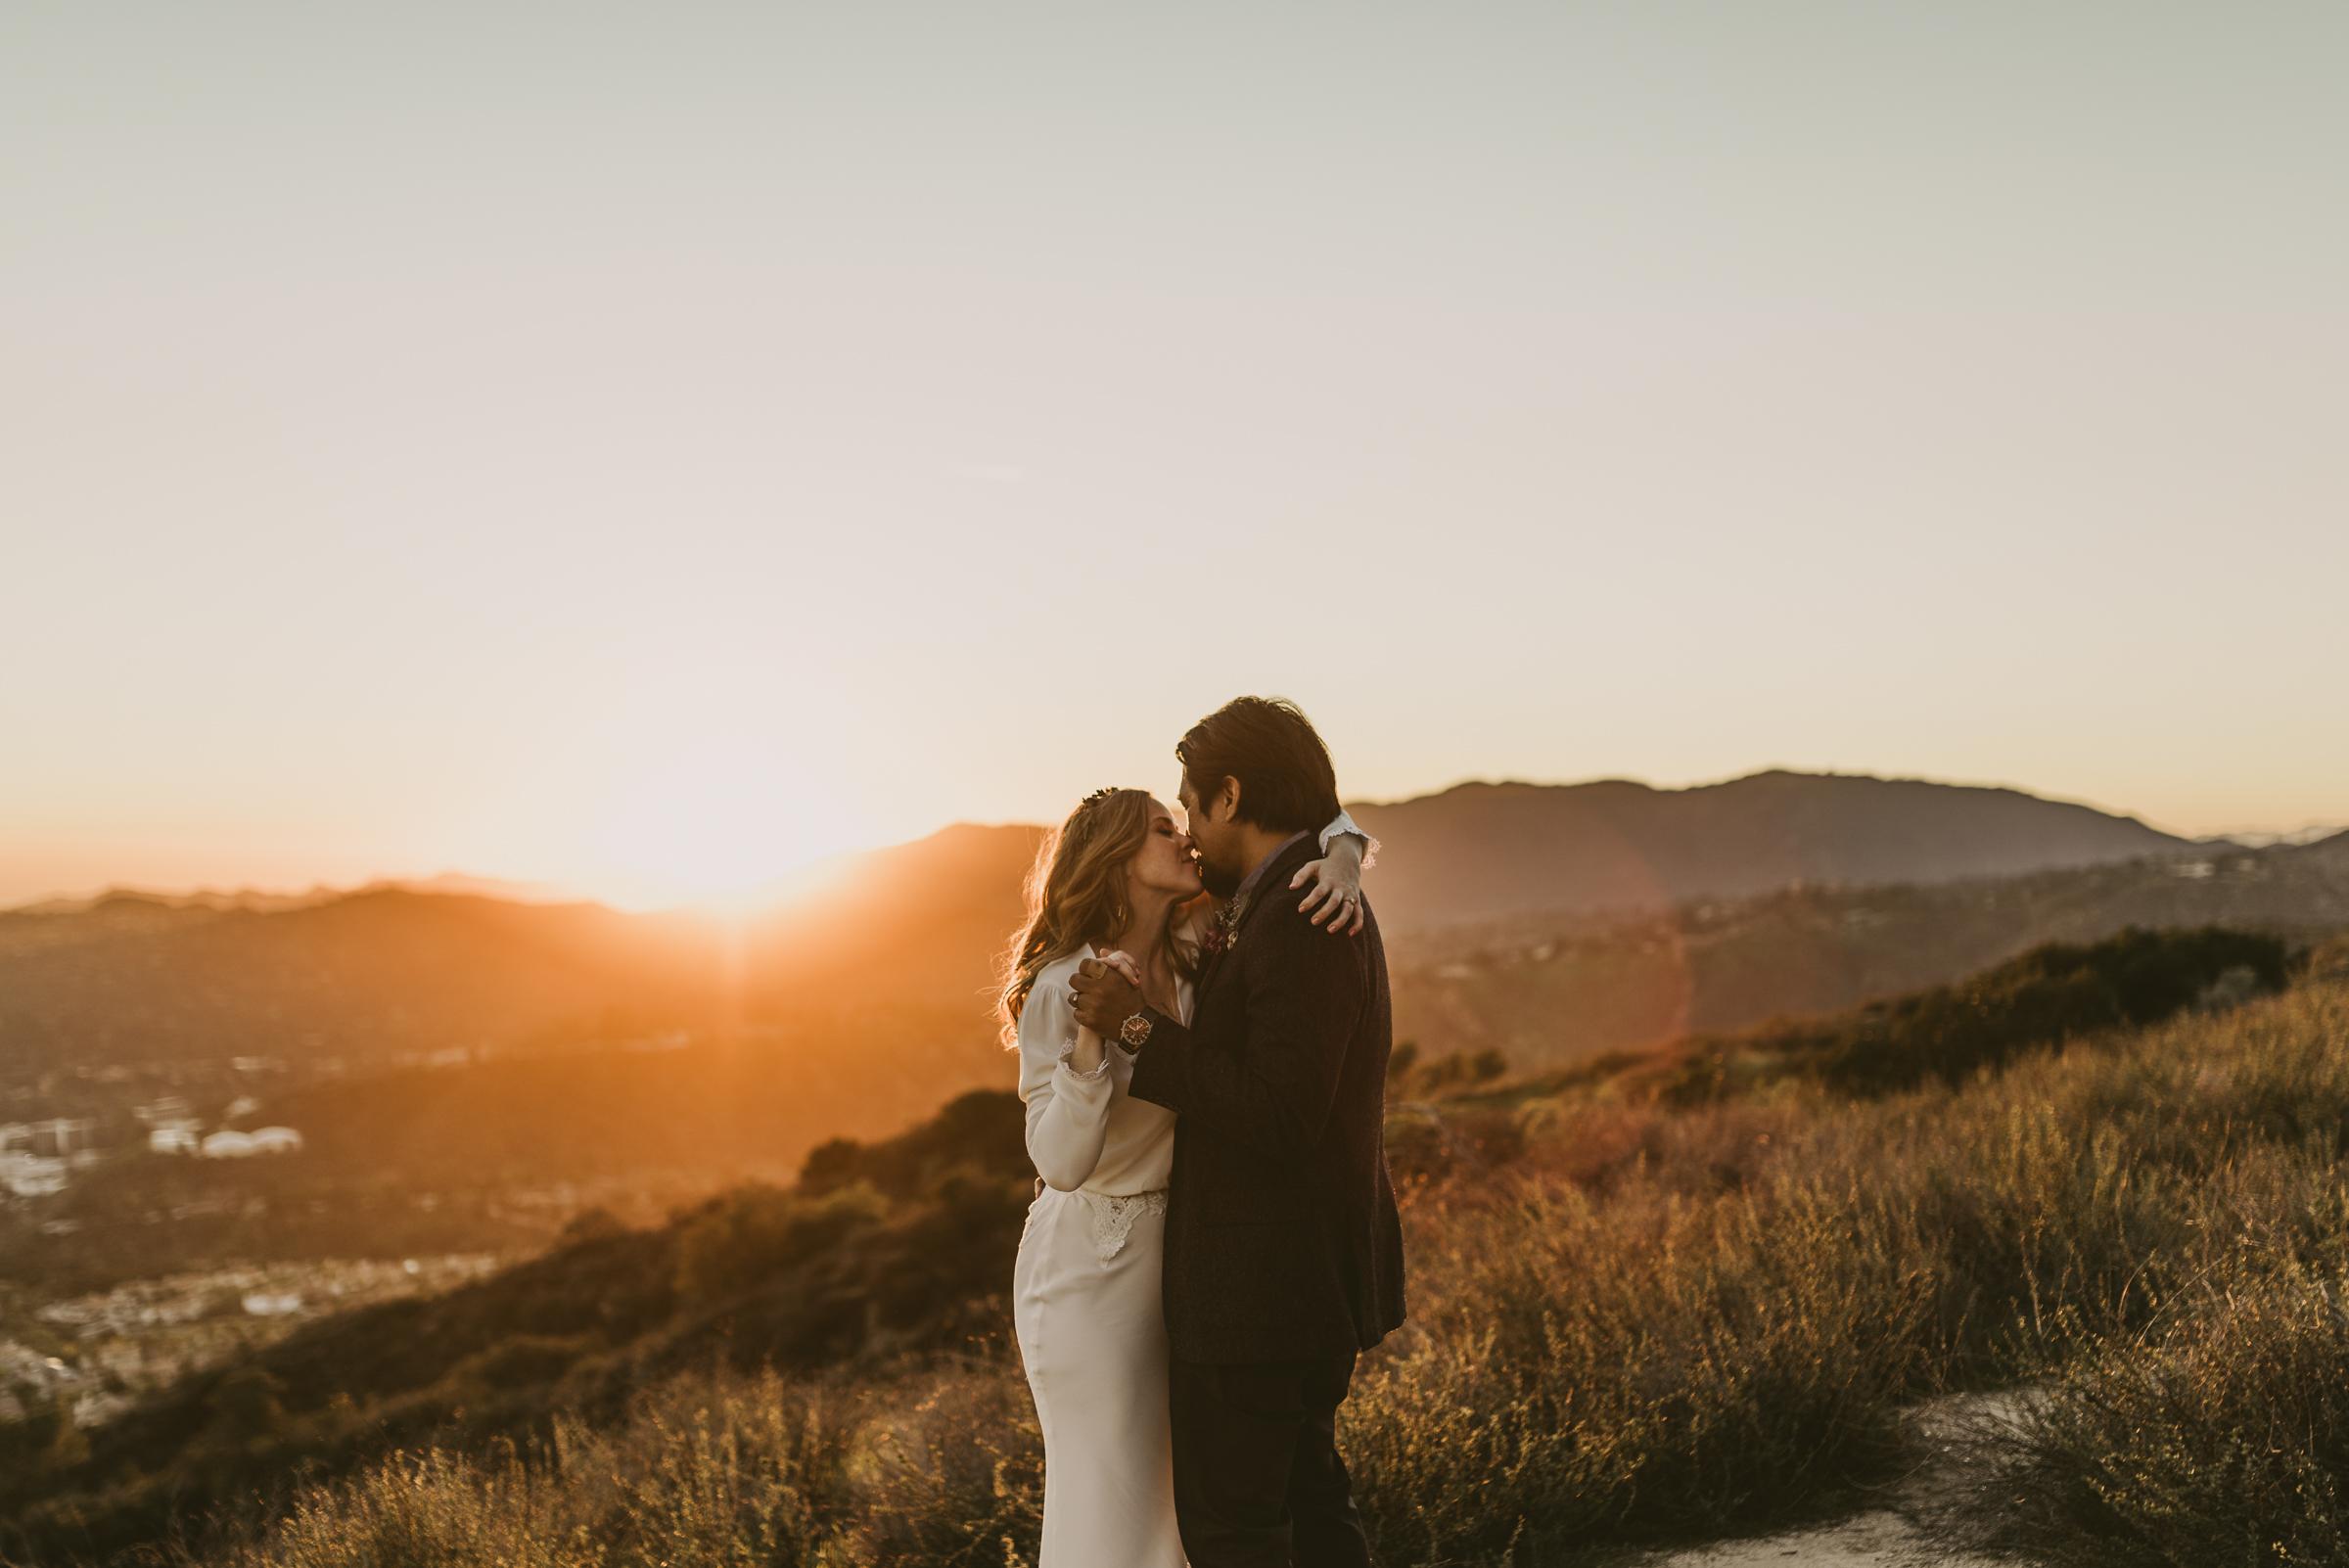 ©Isaiah + Taylor Photography - Intimate Elopement, Eaton Canyon, Los Angeles Wedding Photographer-96.jpg